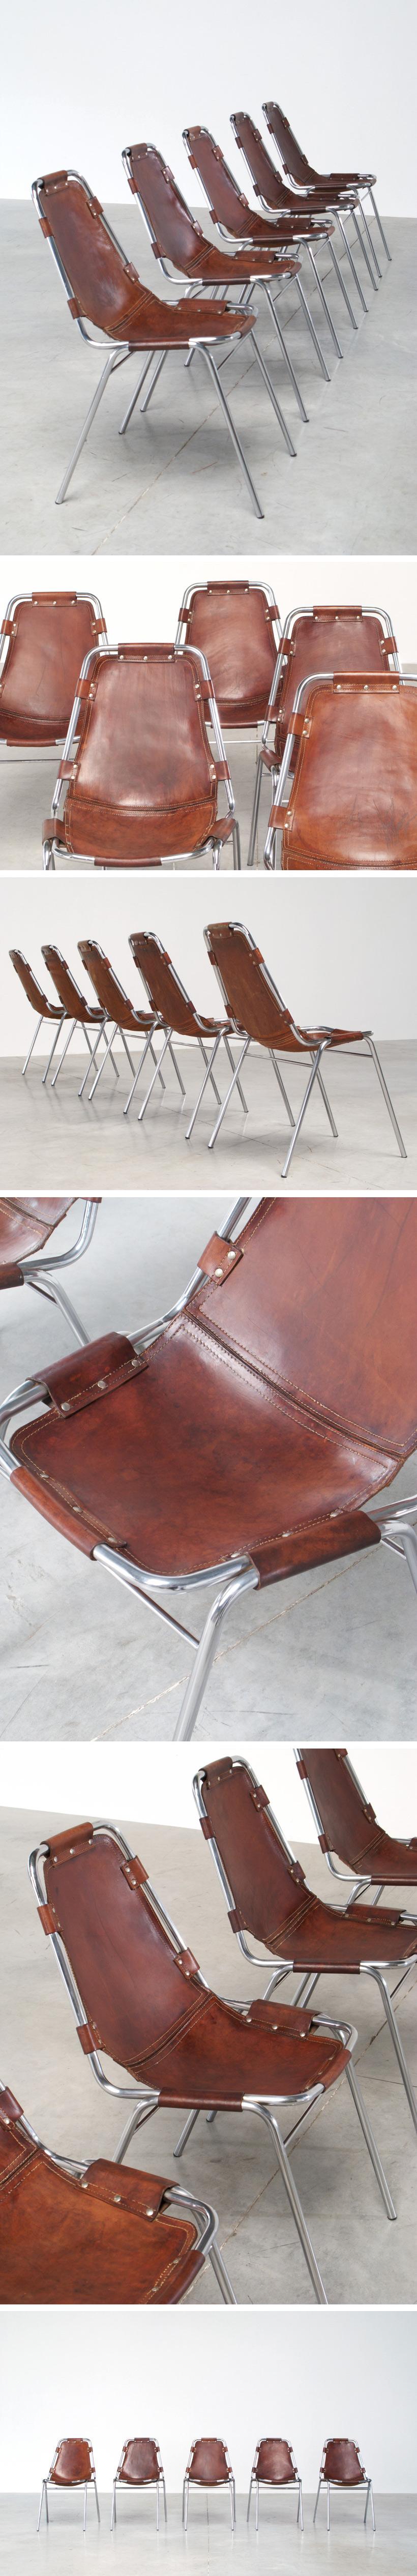 Charlotte Perriand 5 leather chairs Les Arcs Ski Resort Large